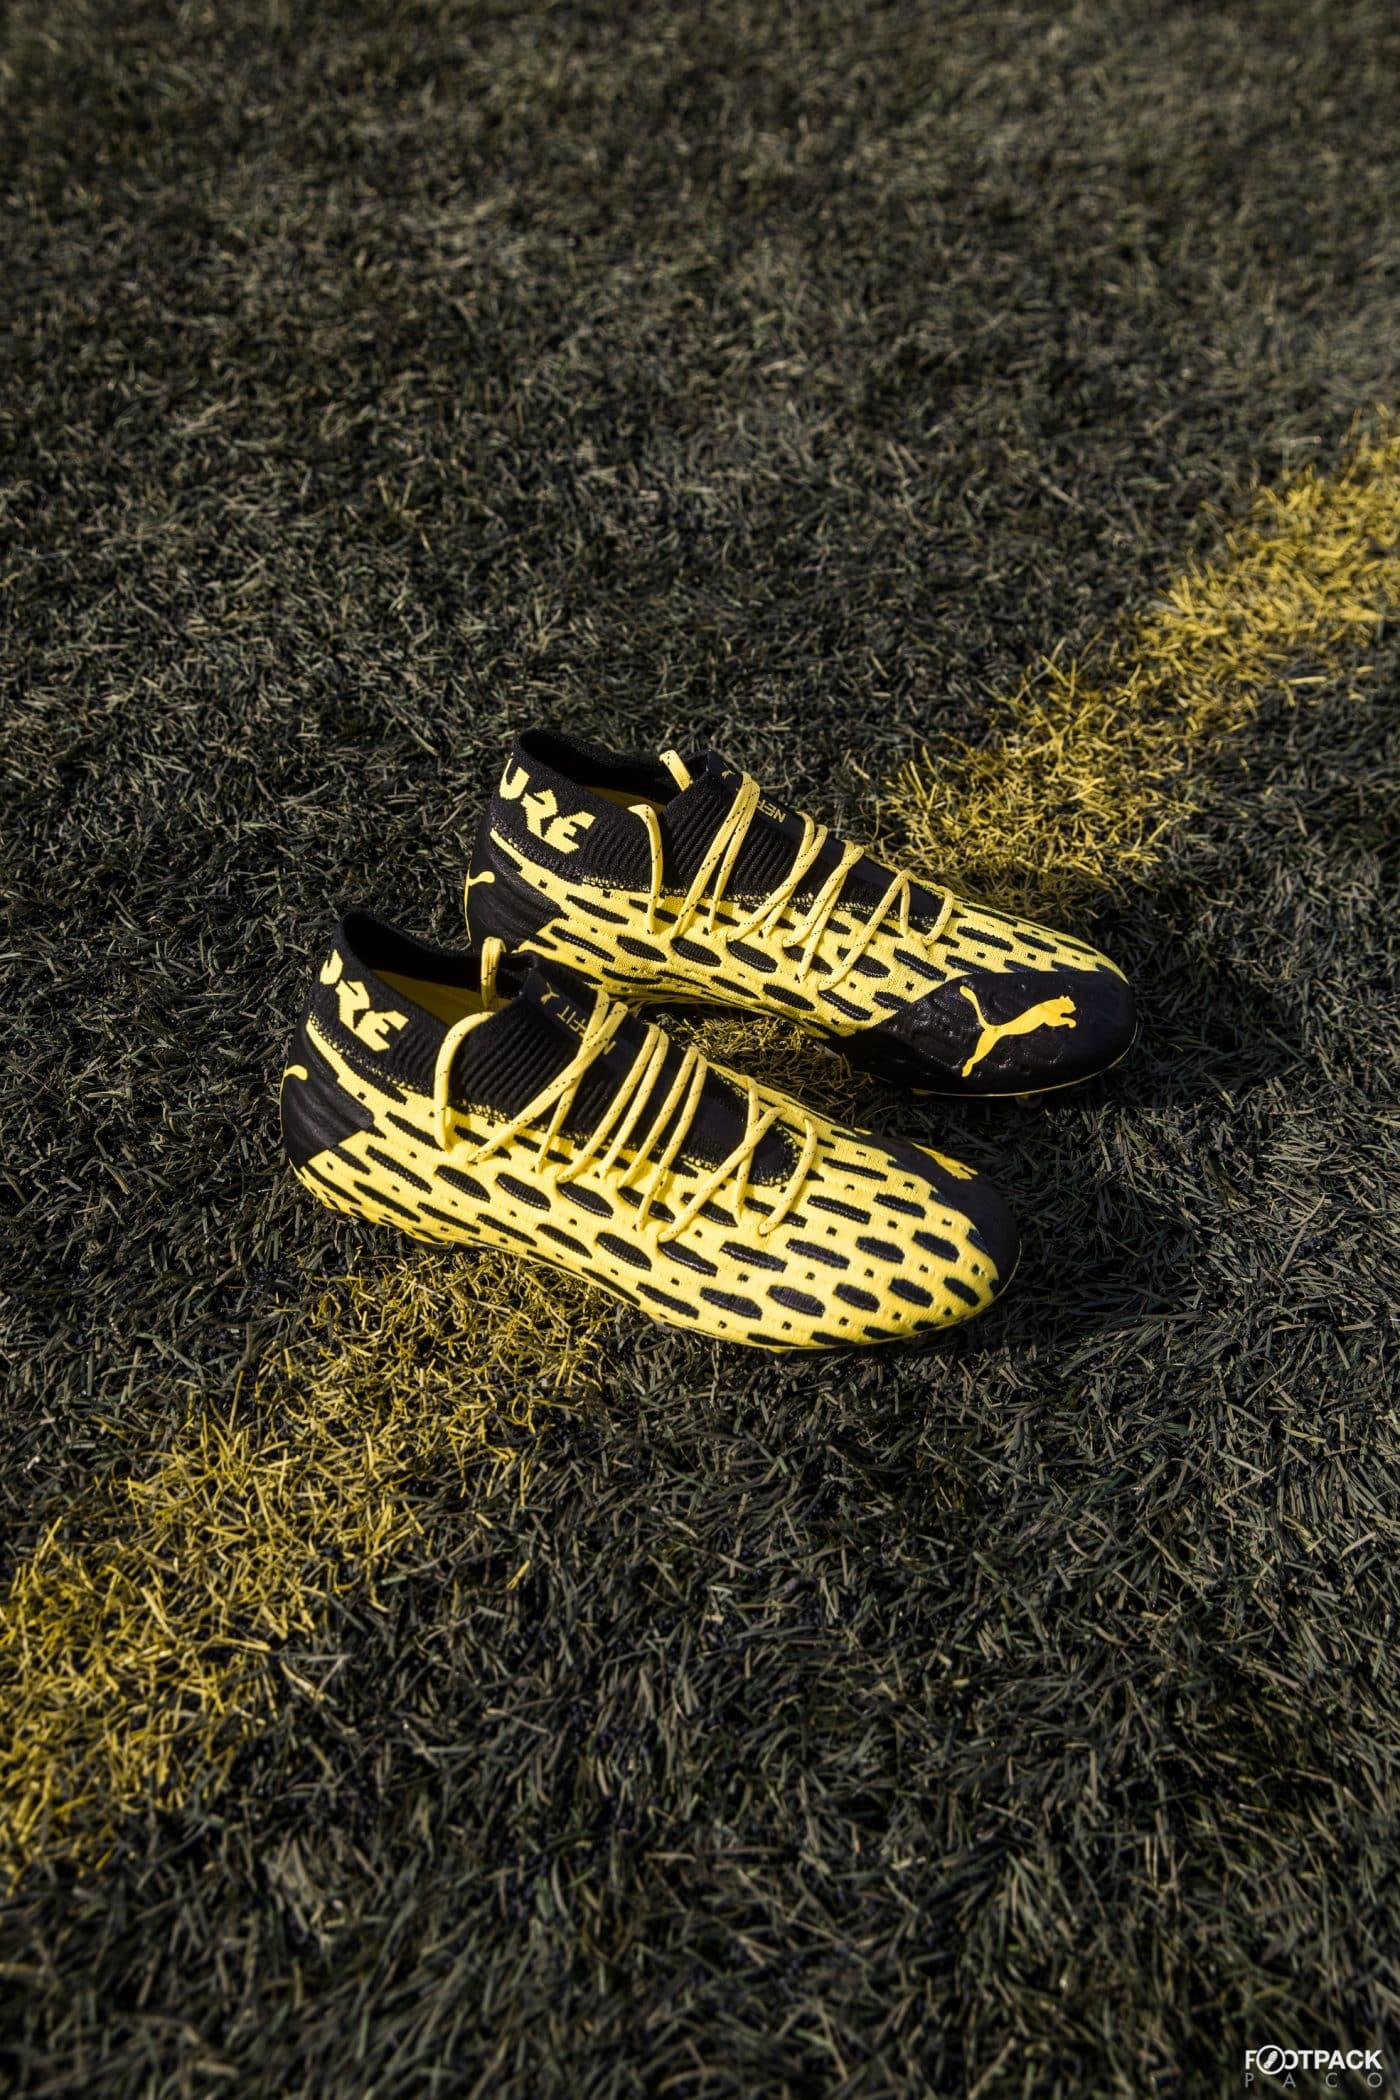 chaussures-de-foot-puma-future-5.1-spark-janvier-2020-footpack-7